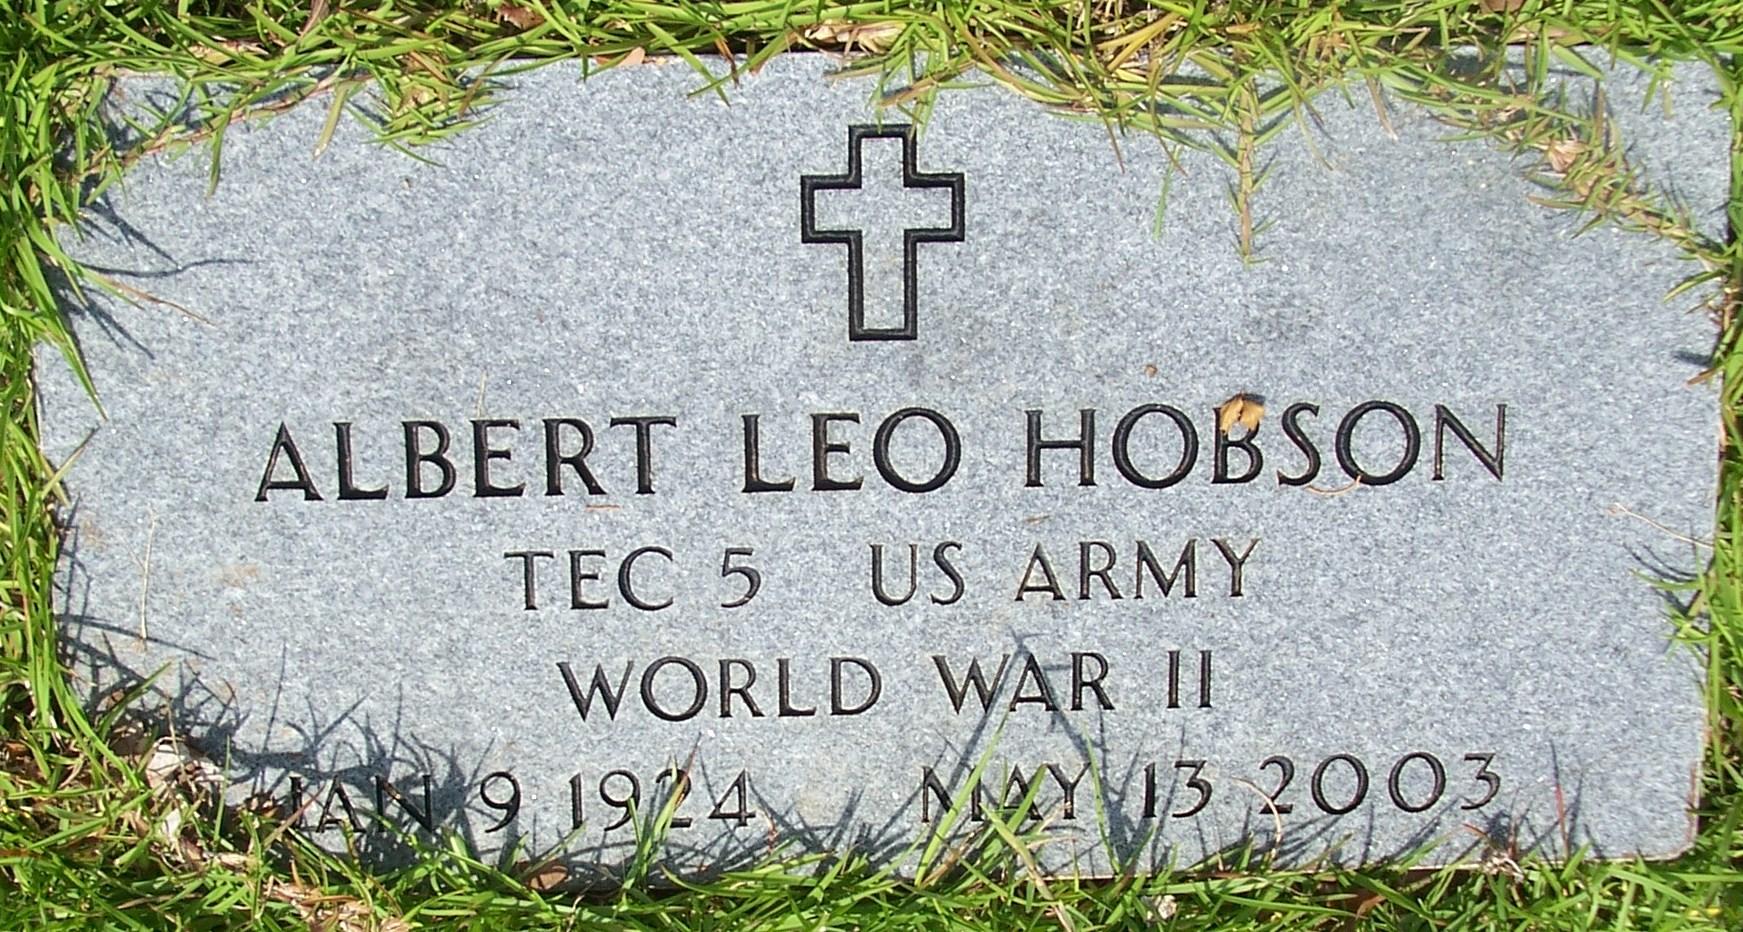 Albert Leo Hobson